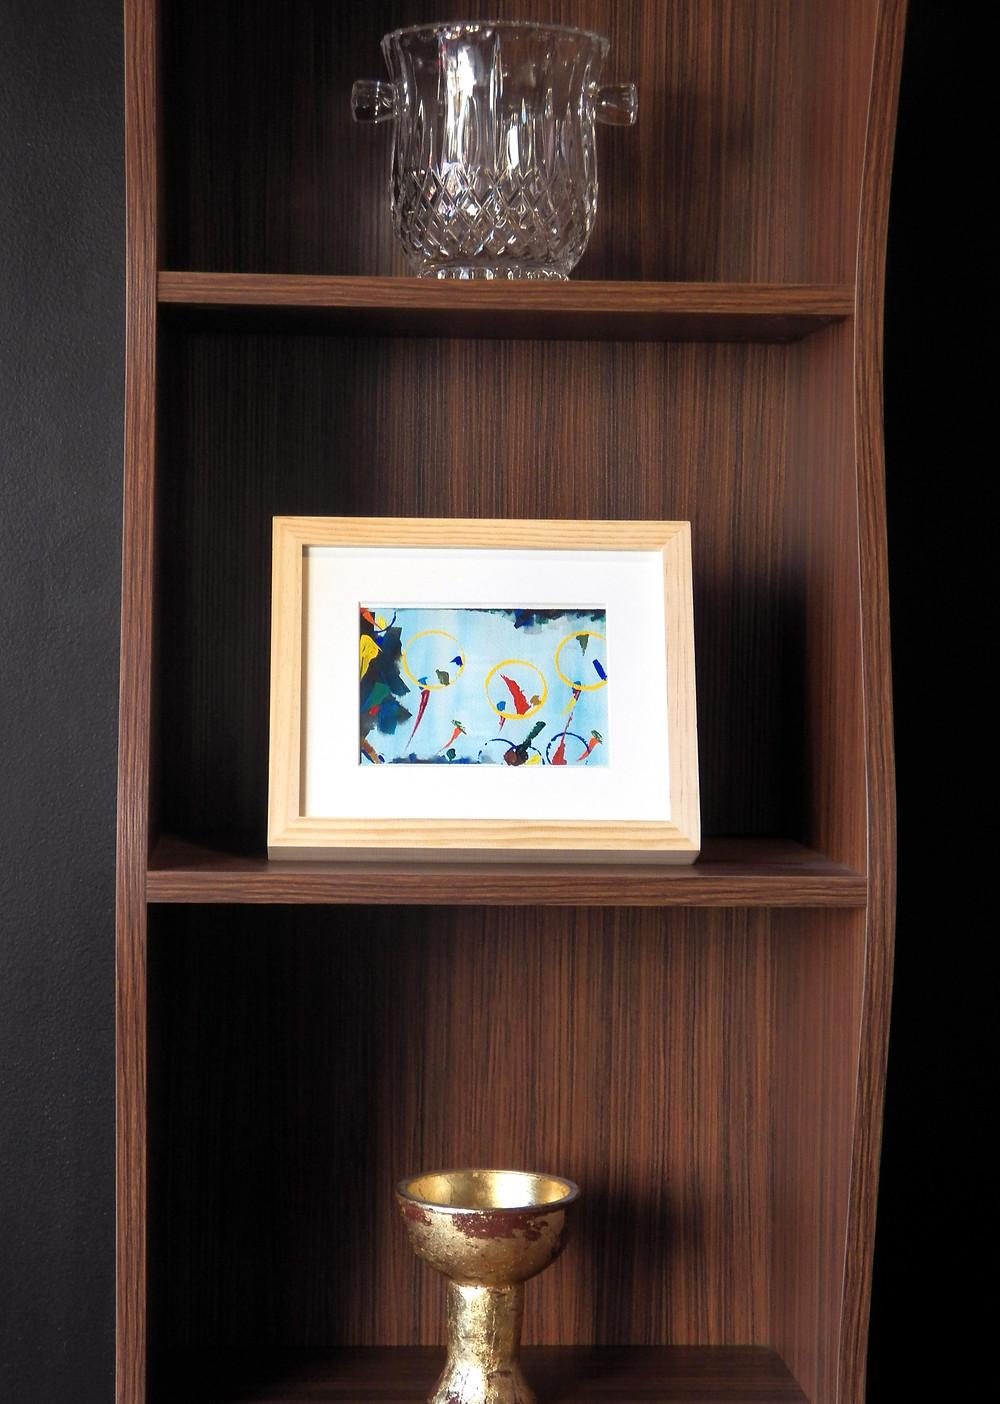 Bookshelf, Brown Bookshelf, Wooden Bookshelf, Interior Design, Abstract Painting